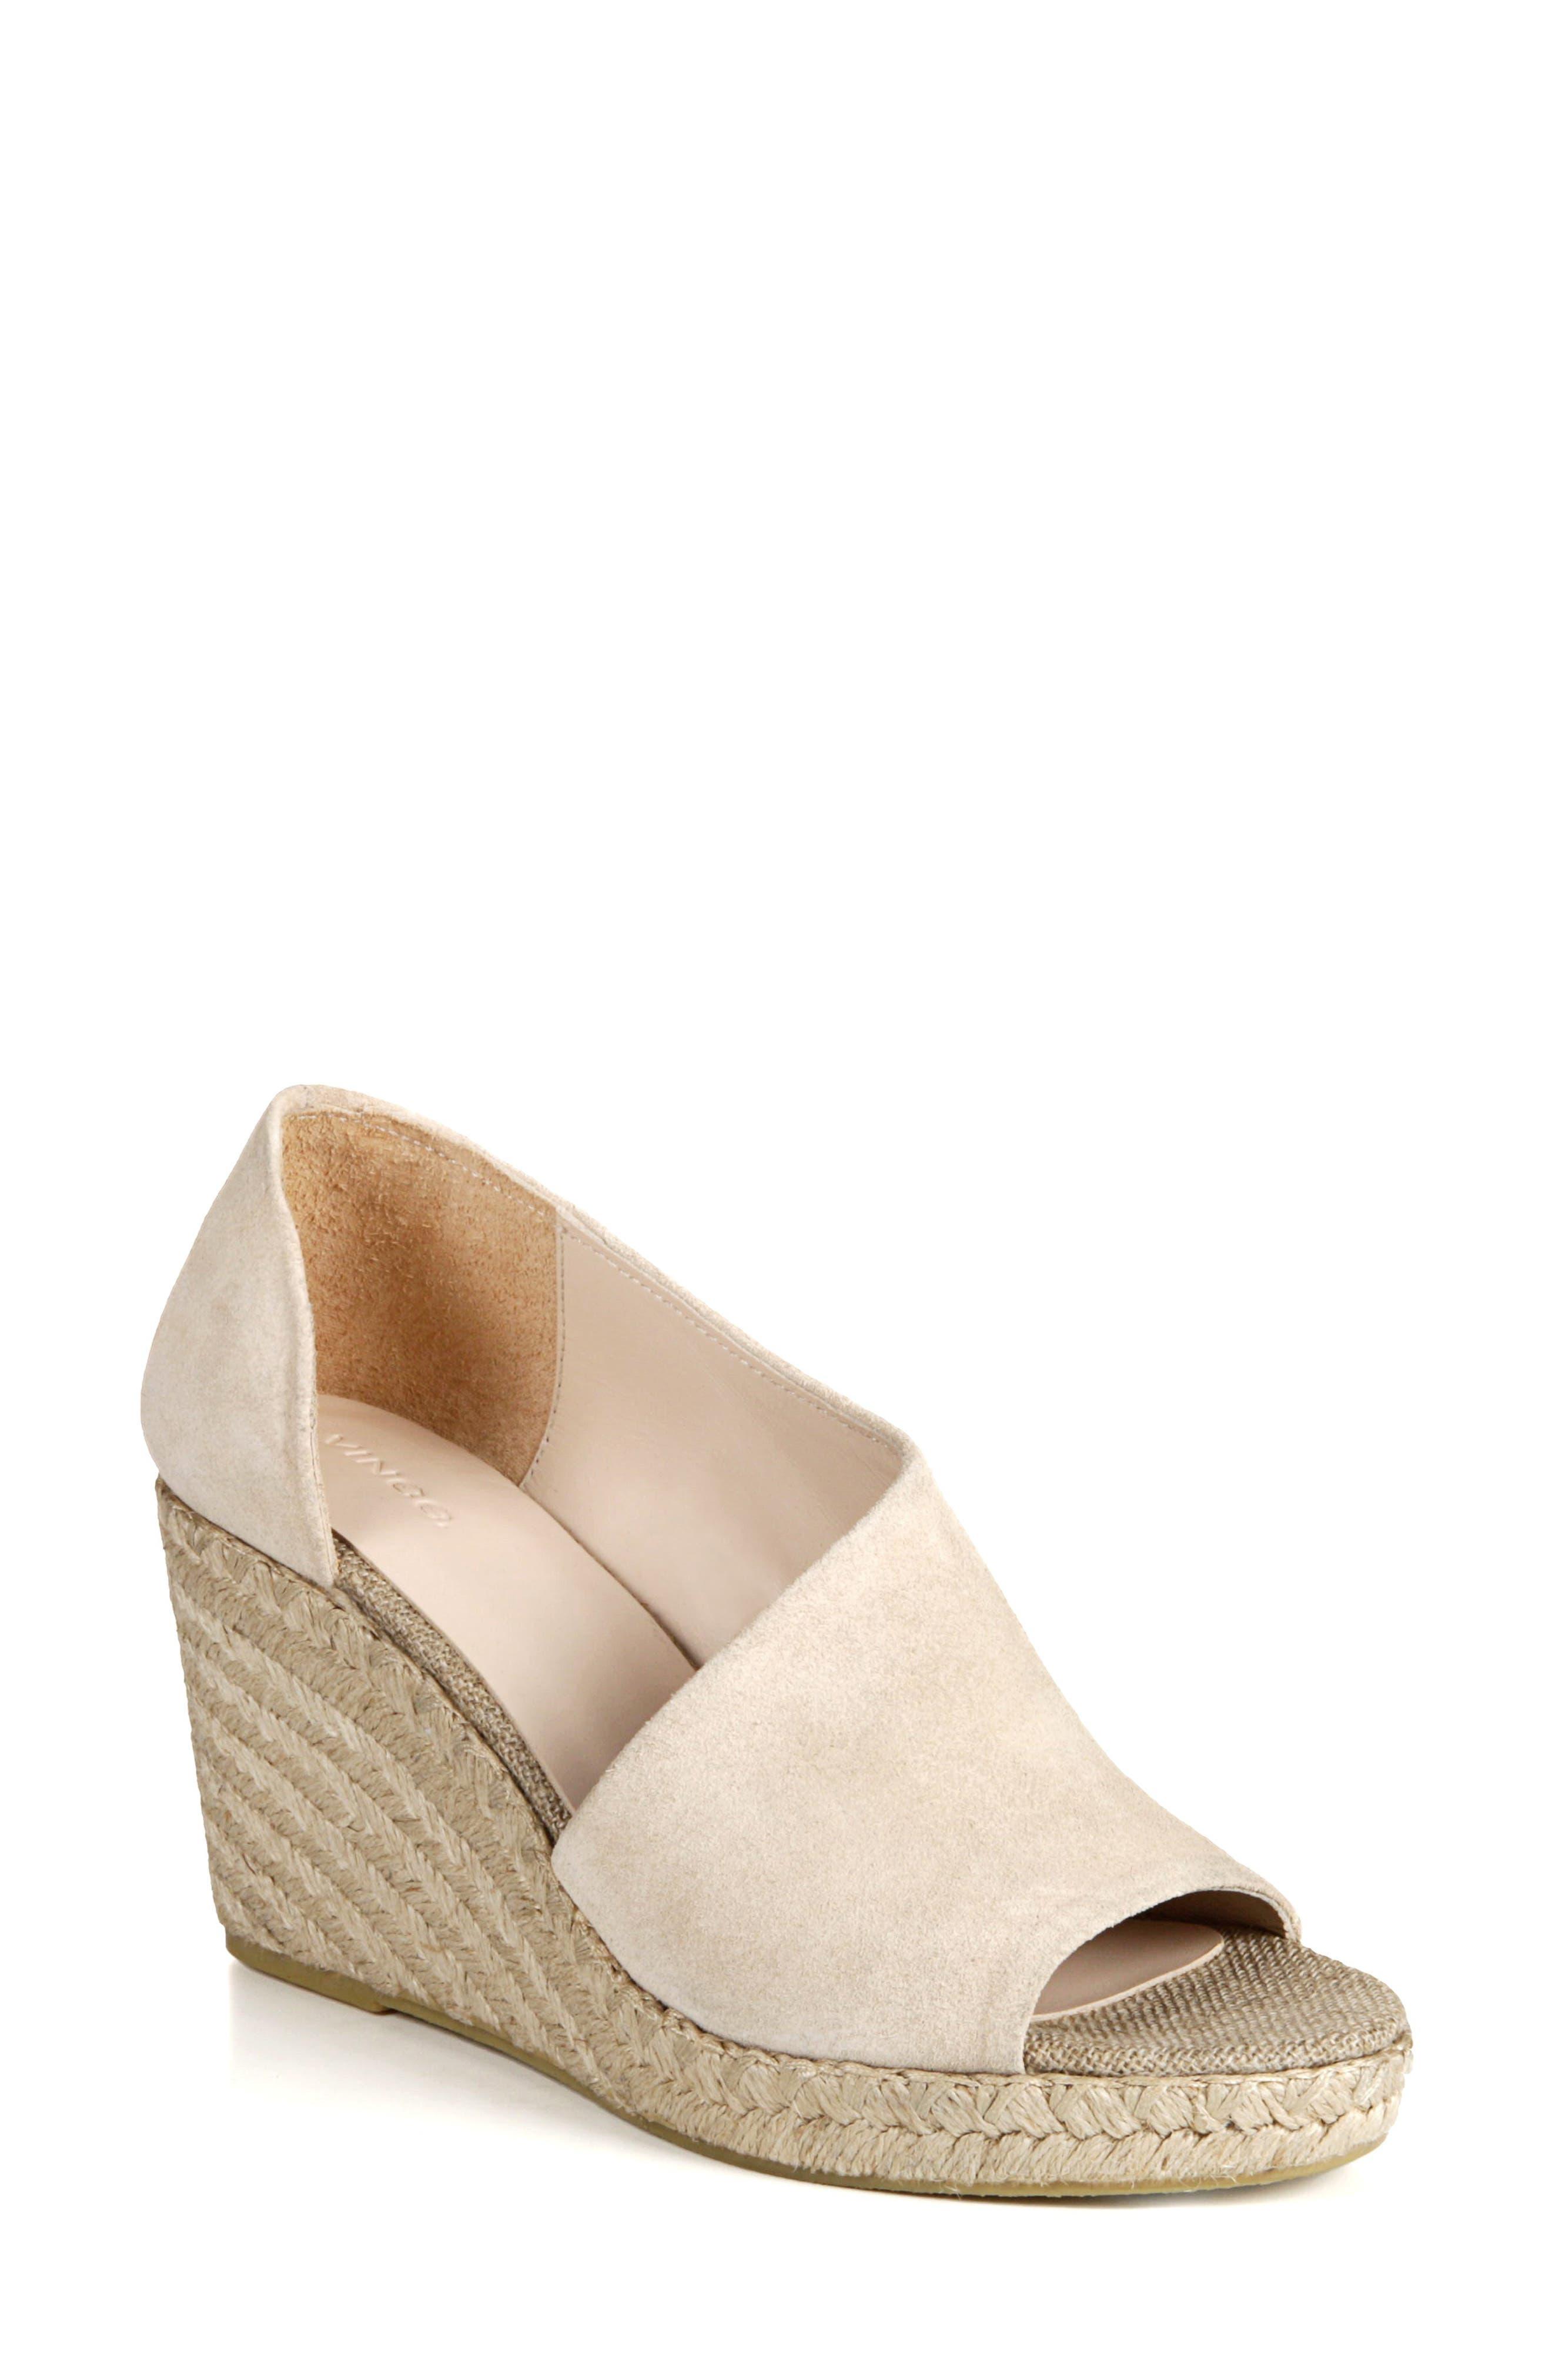 1c87760a4d0f Women s Shoes New Arrivals  Boots